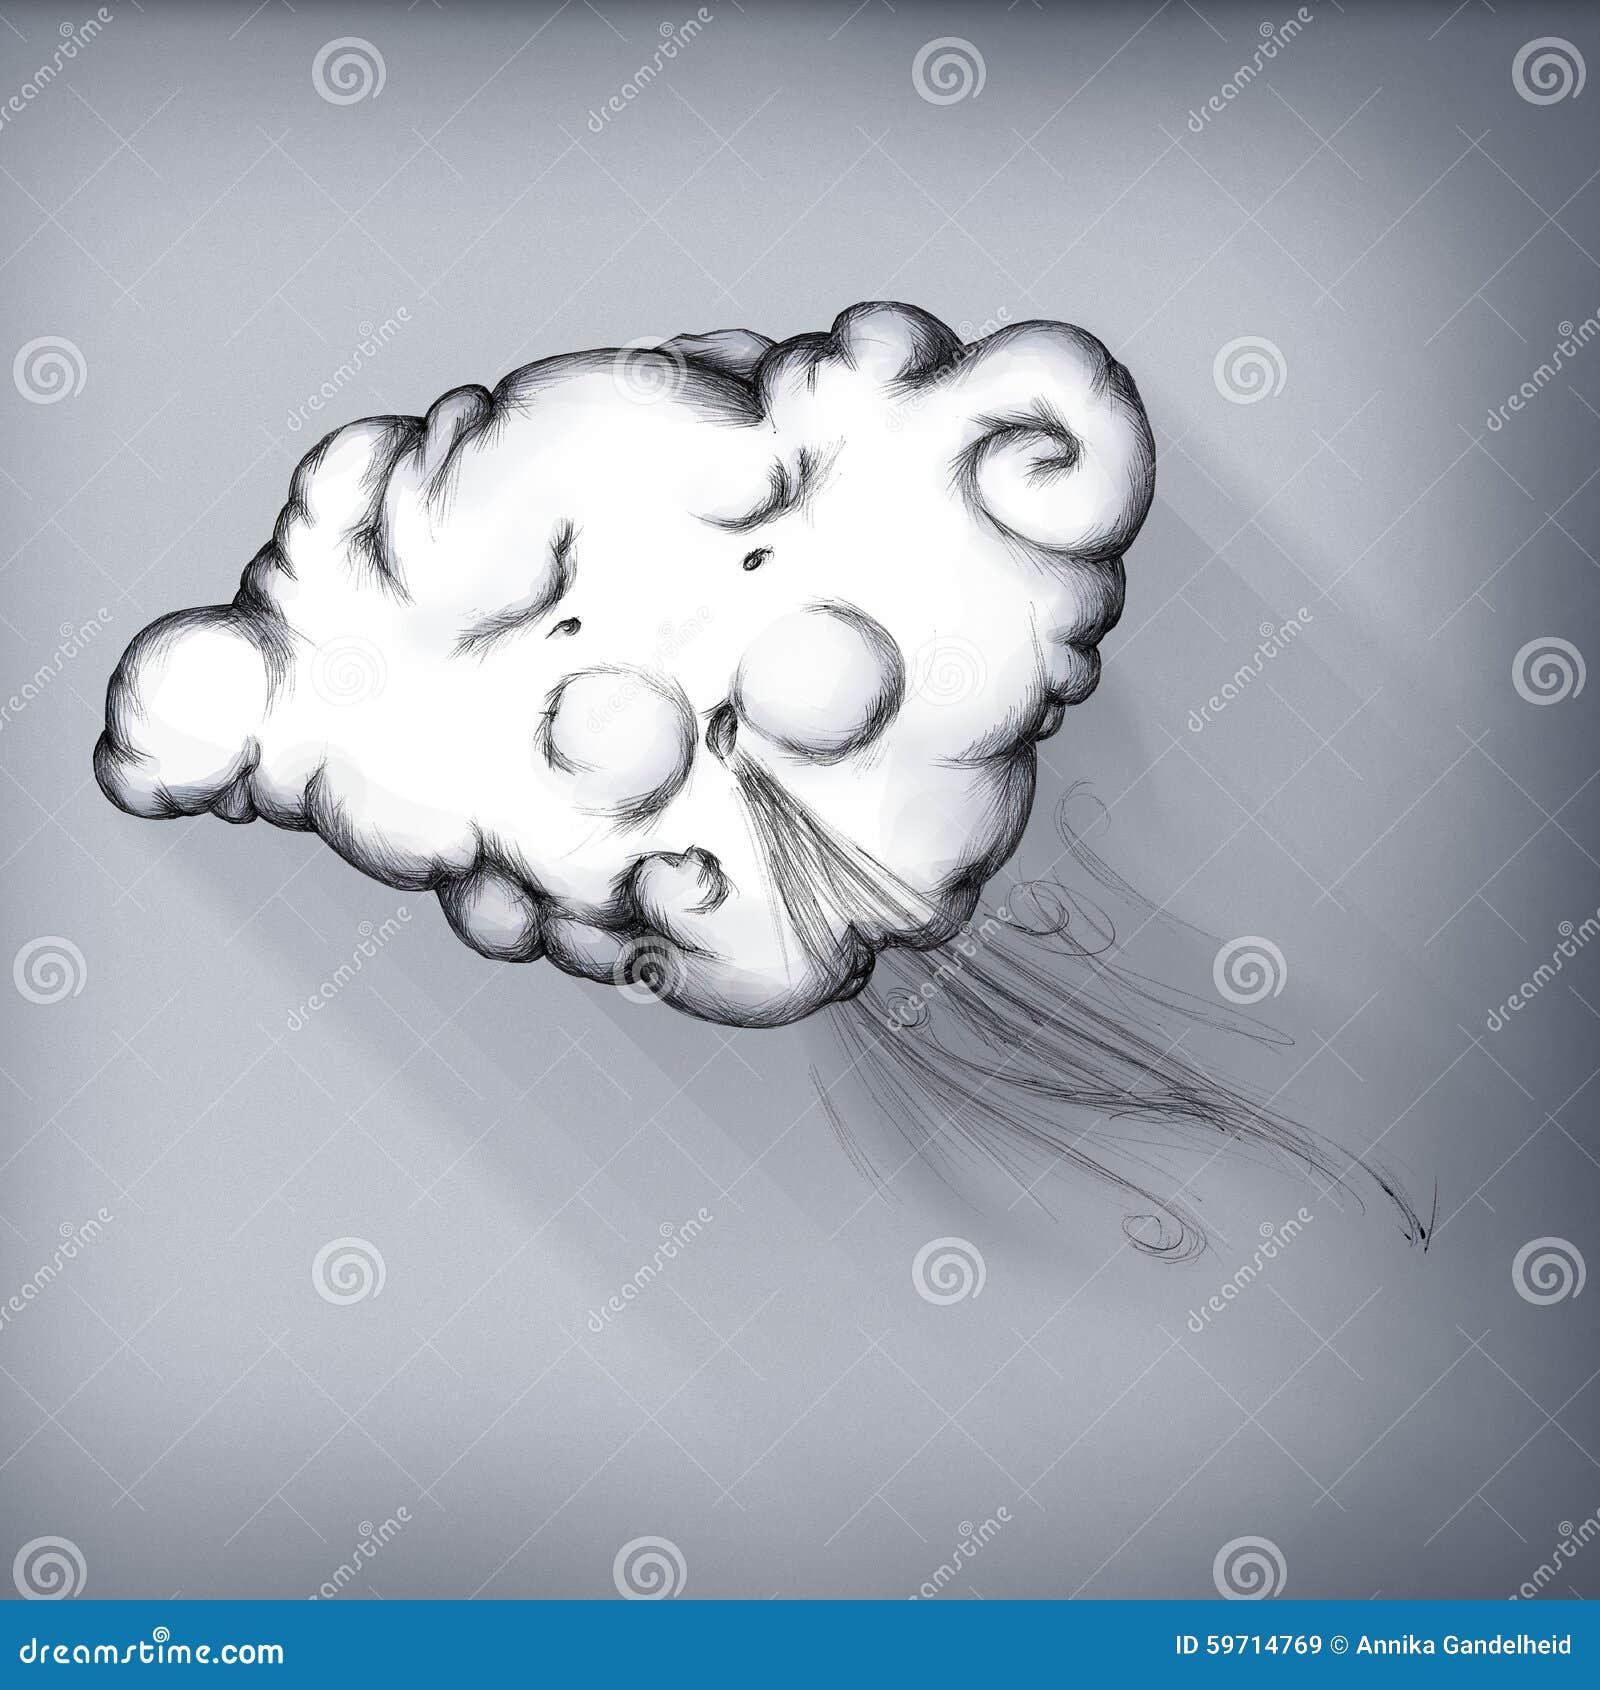 Le nuage souffle le vent illustration stock image 59714769 - Nuage qui souffle ...